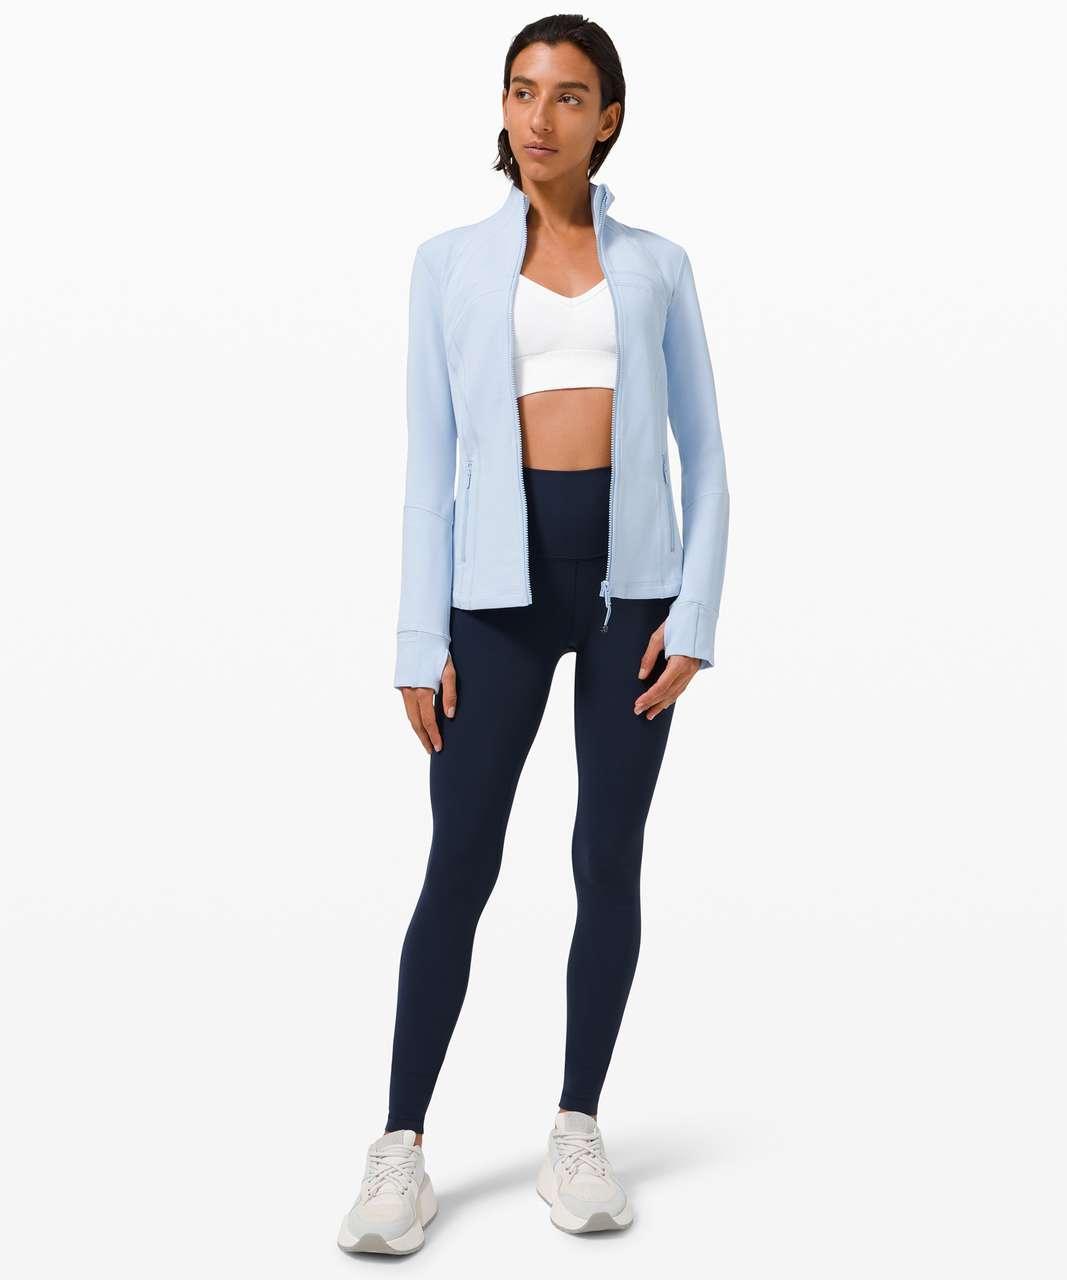 Lululemon Define Jacket - Blue Linen